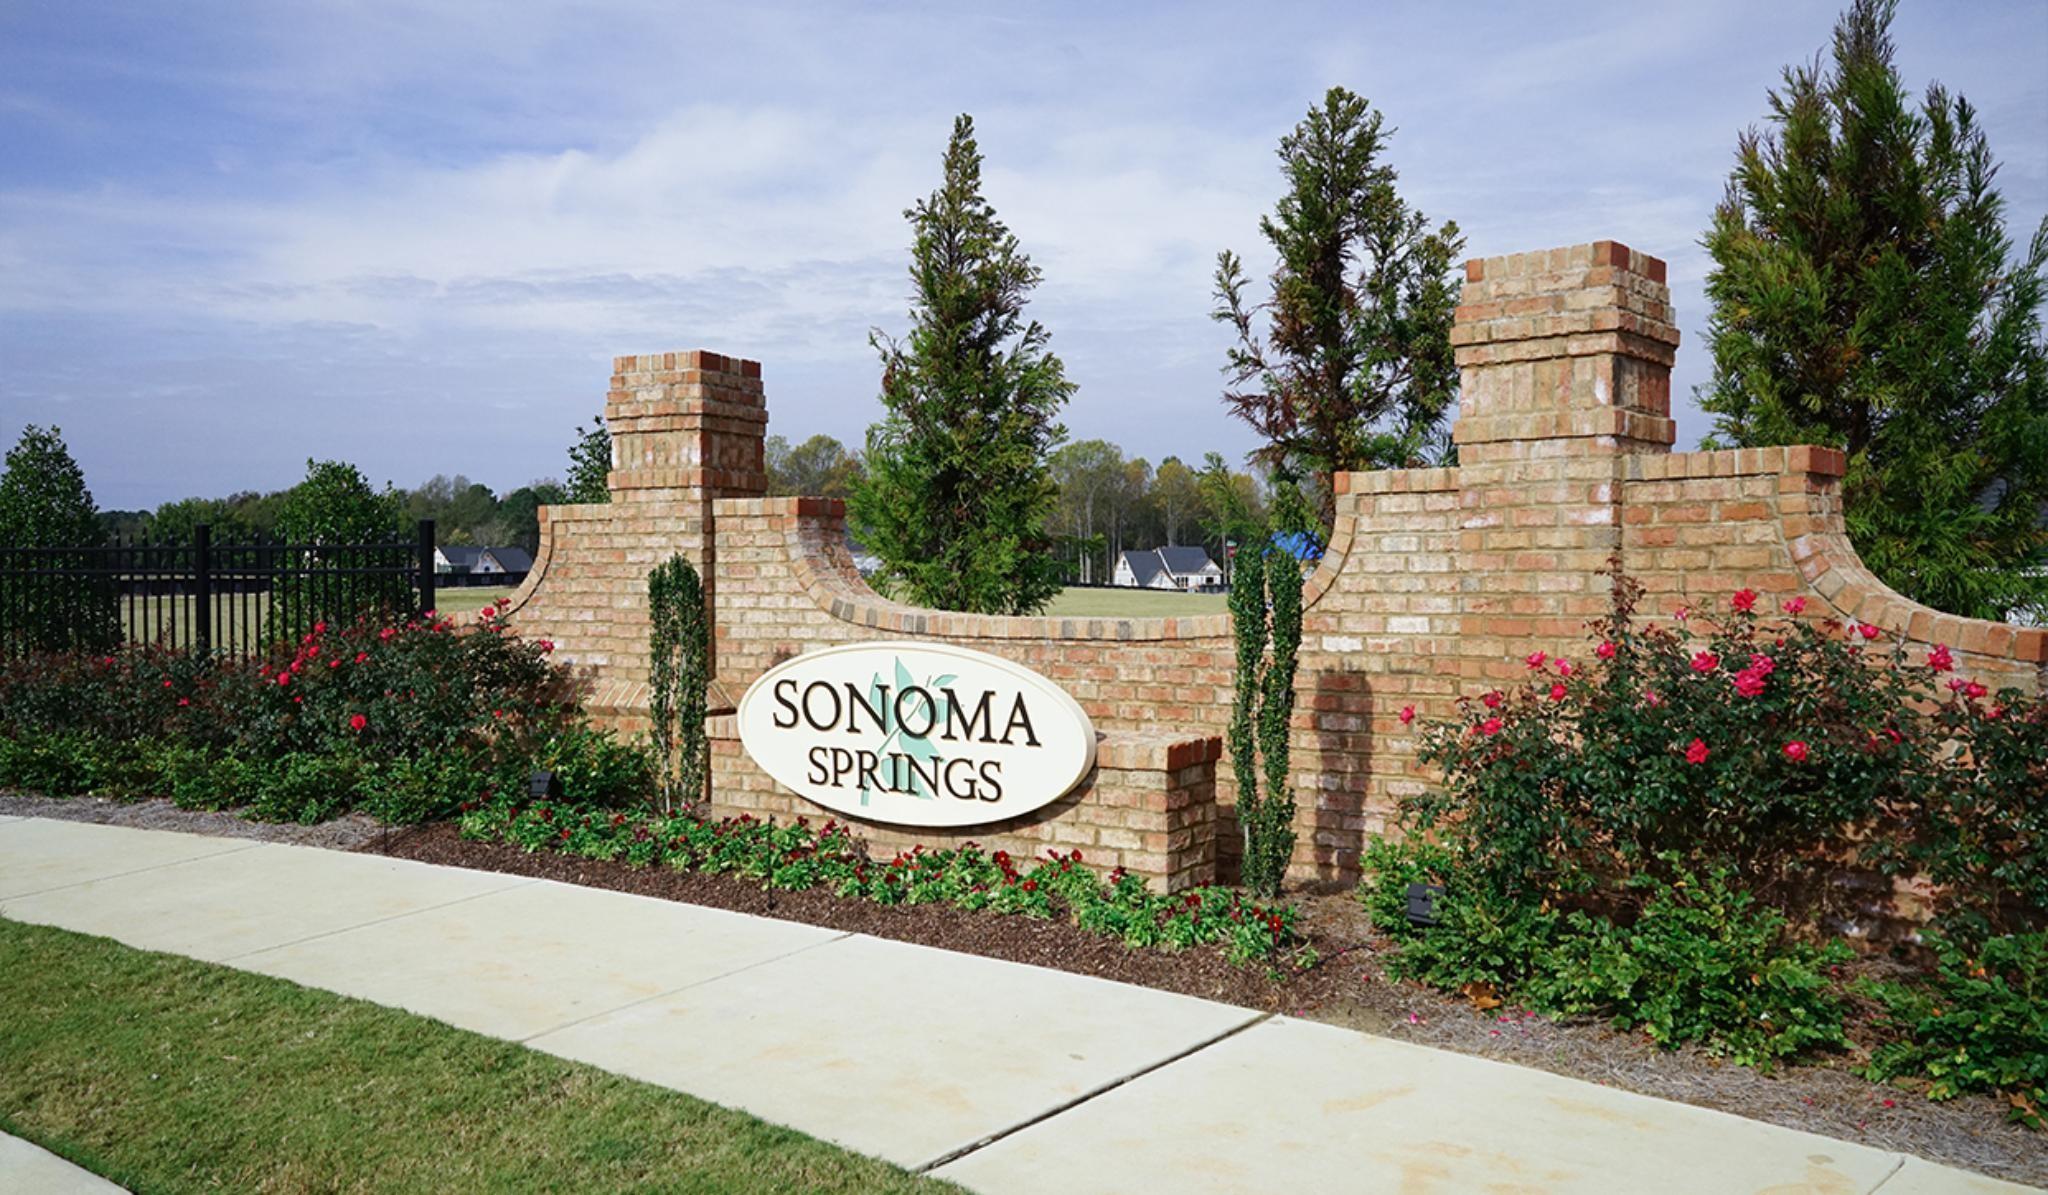 Sonoma Springs Community Entrance in Fuquay-Varina